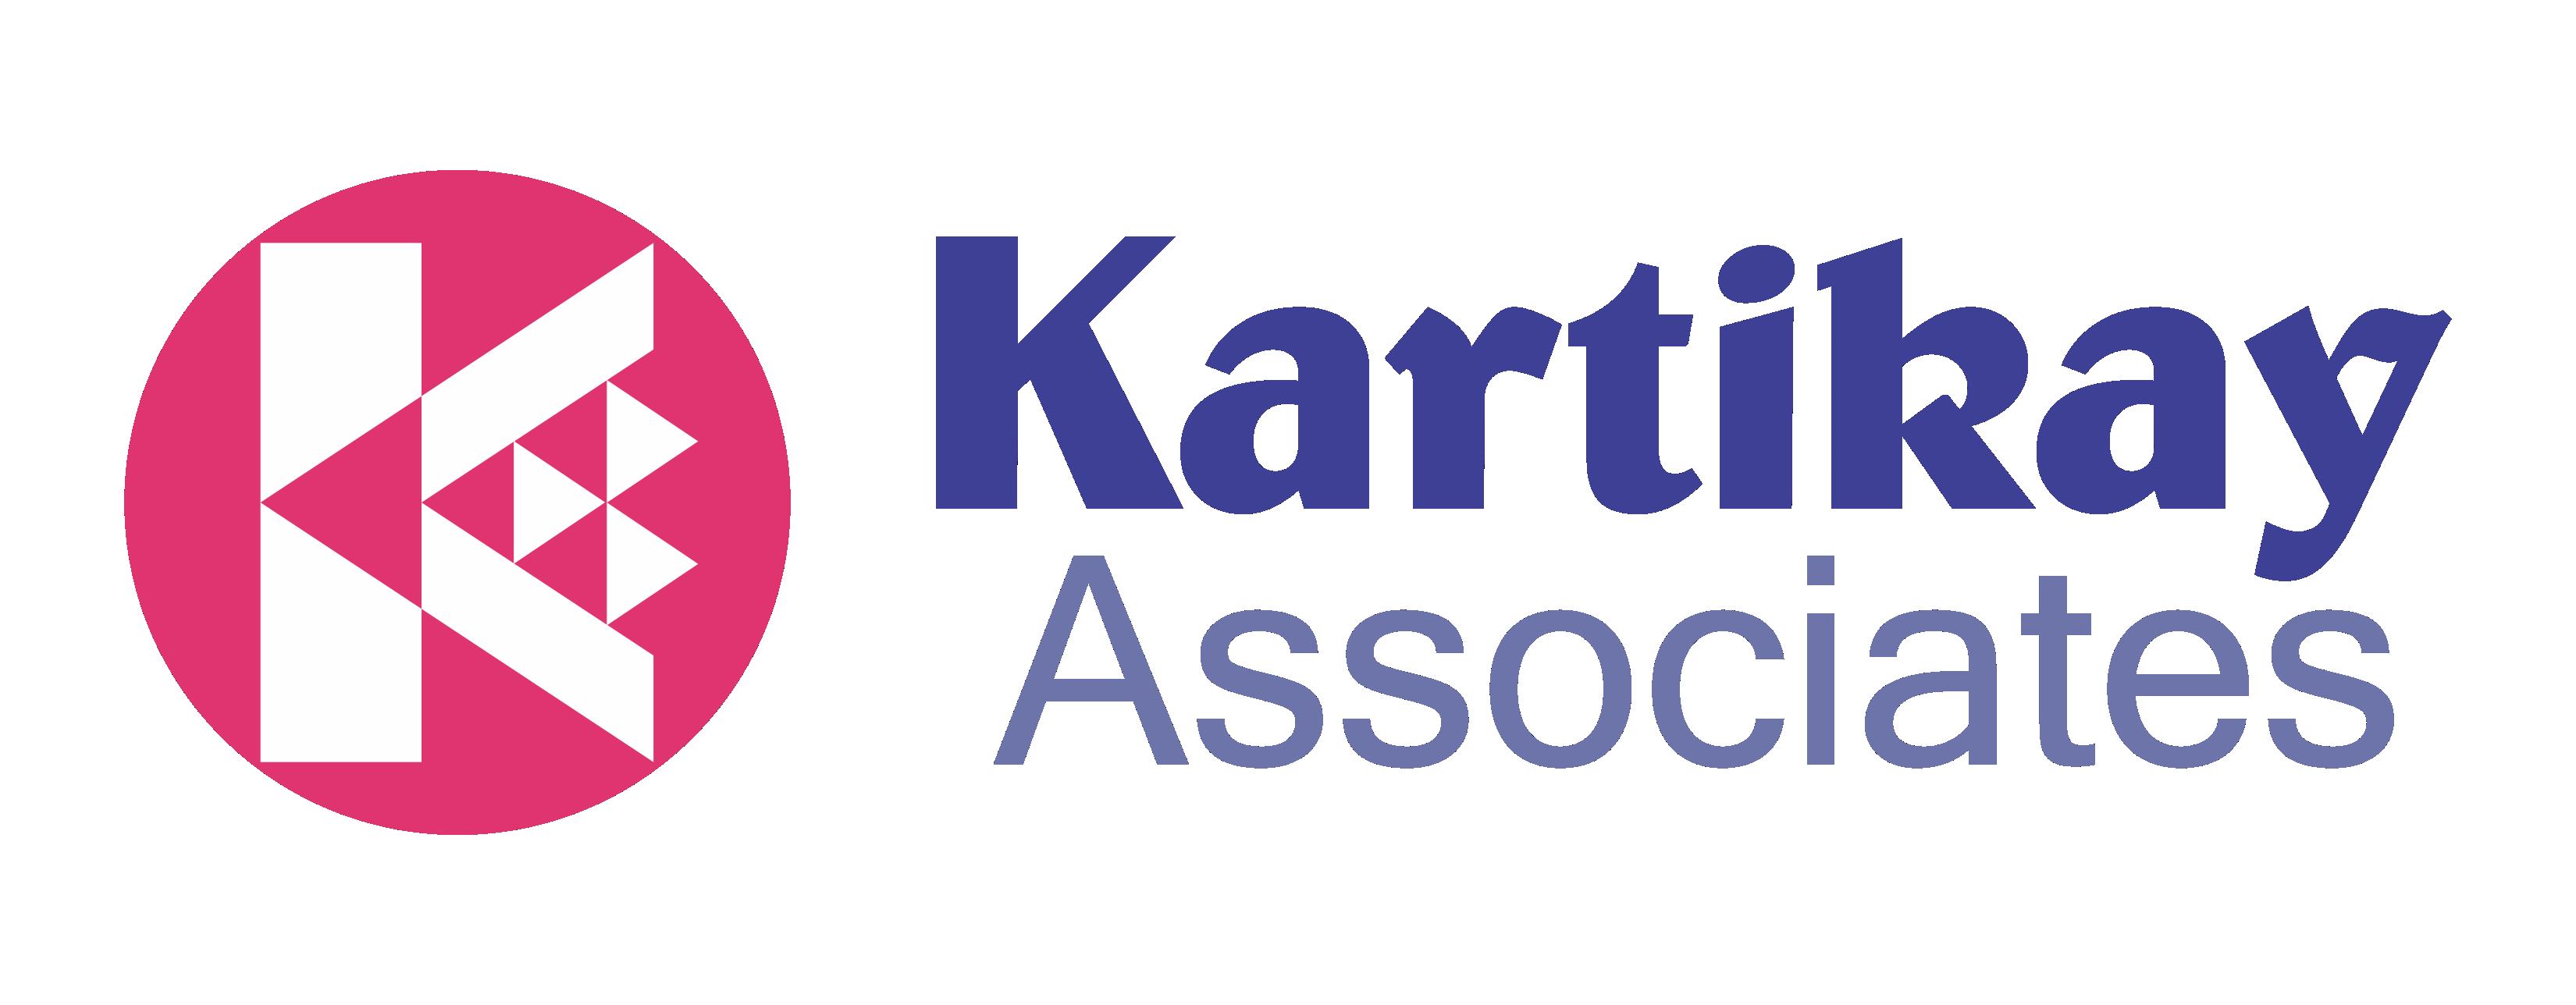 Kartikay Associates